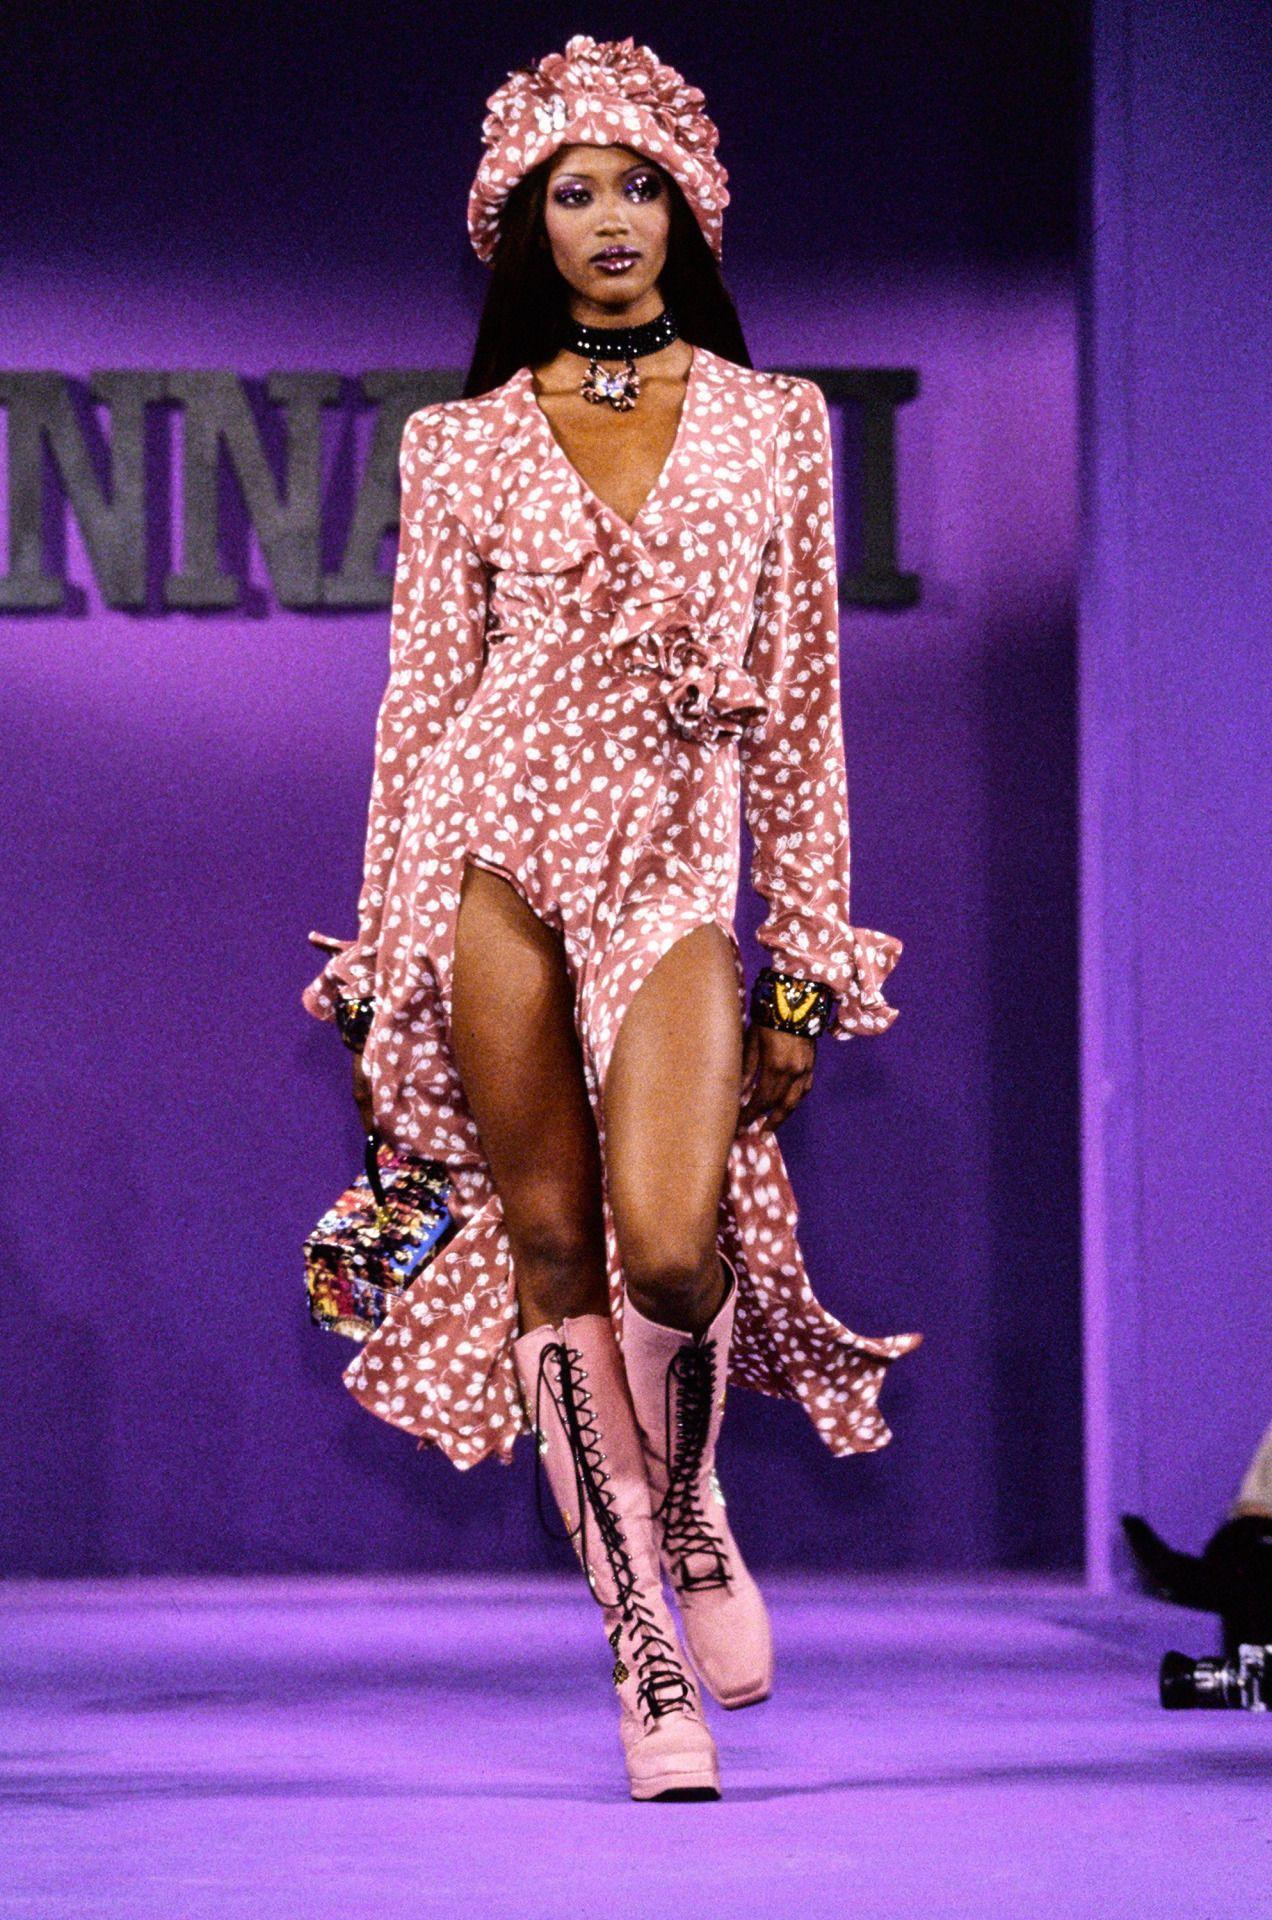 Bikini Yasmeen Ghauri CAN 21996-1997 nudes (85 pics) Young, Snapchat, bra